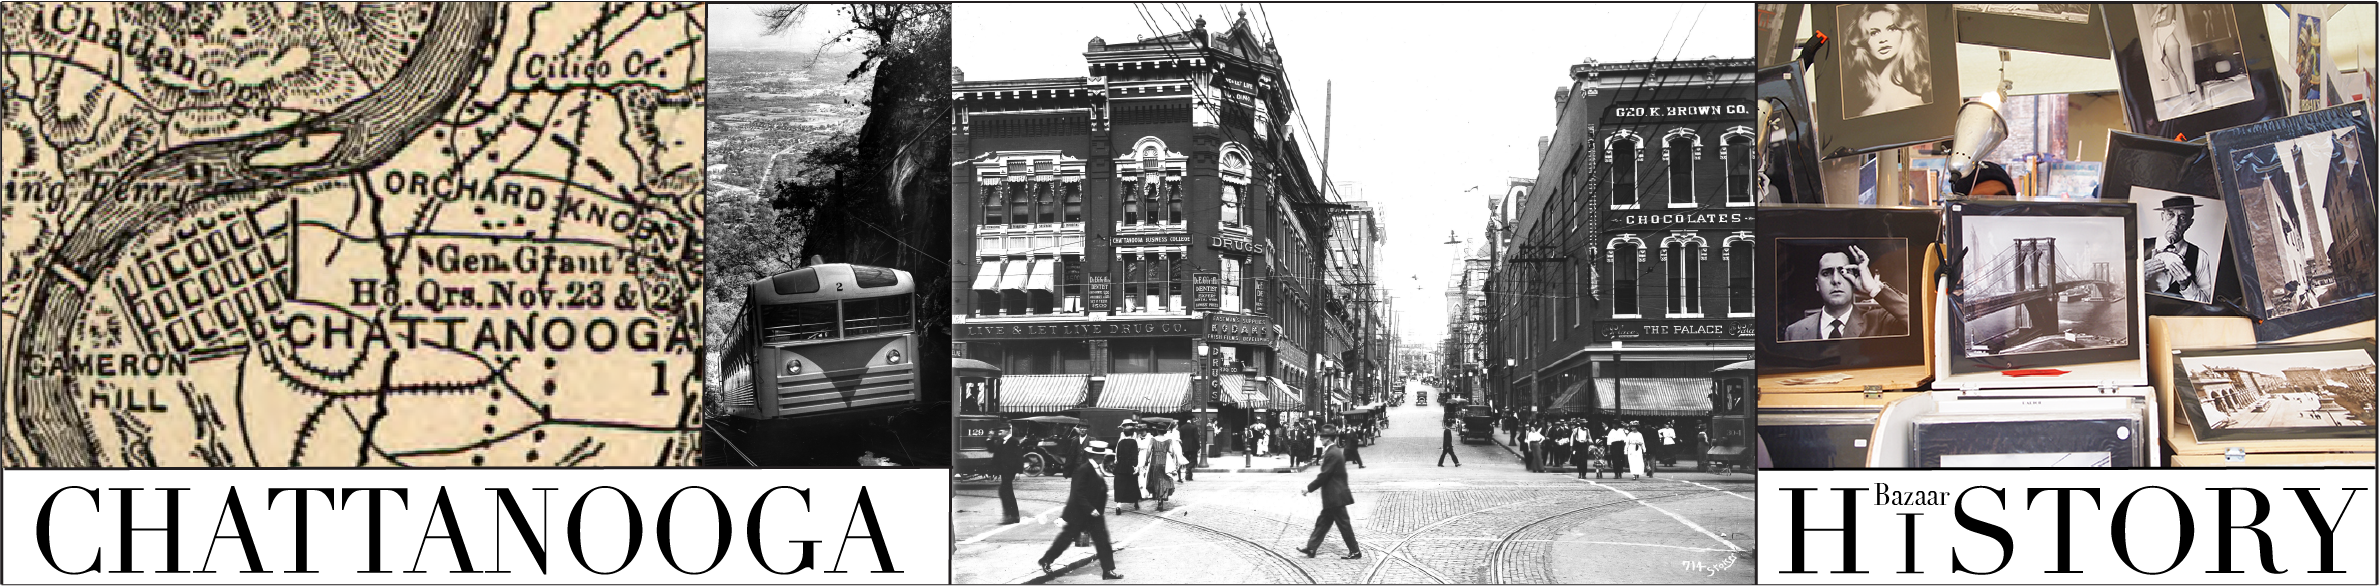 Chattanooga History